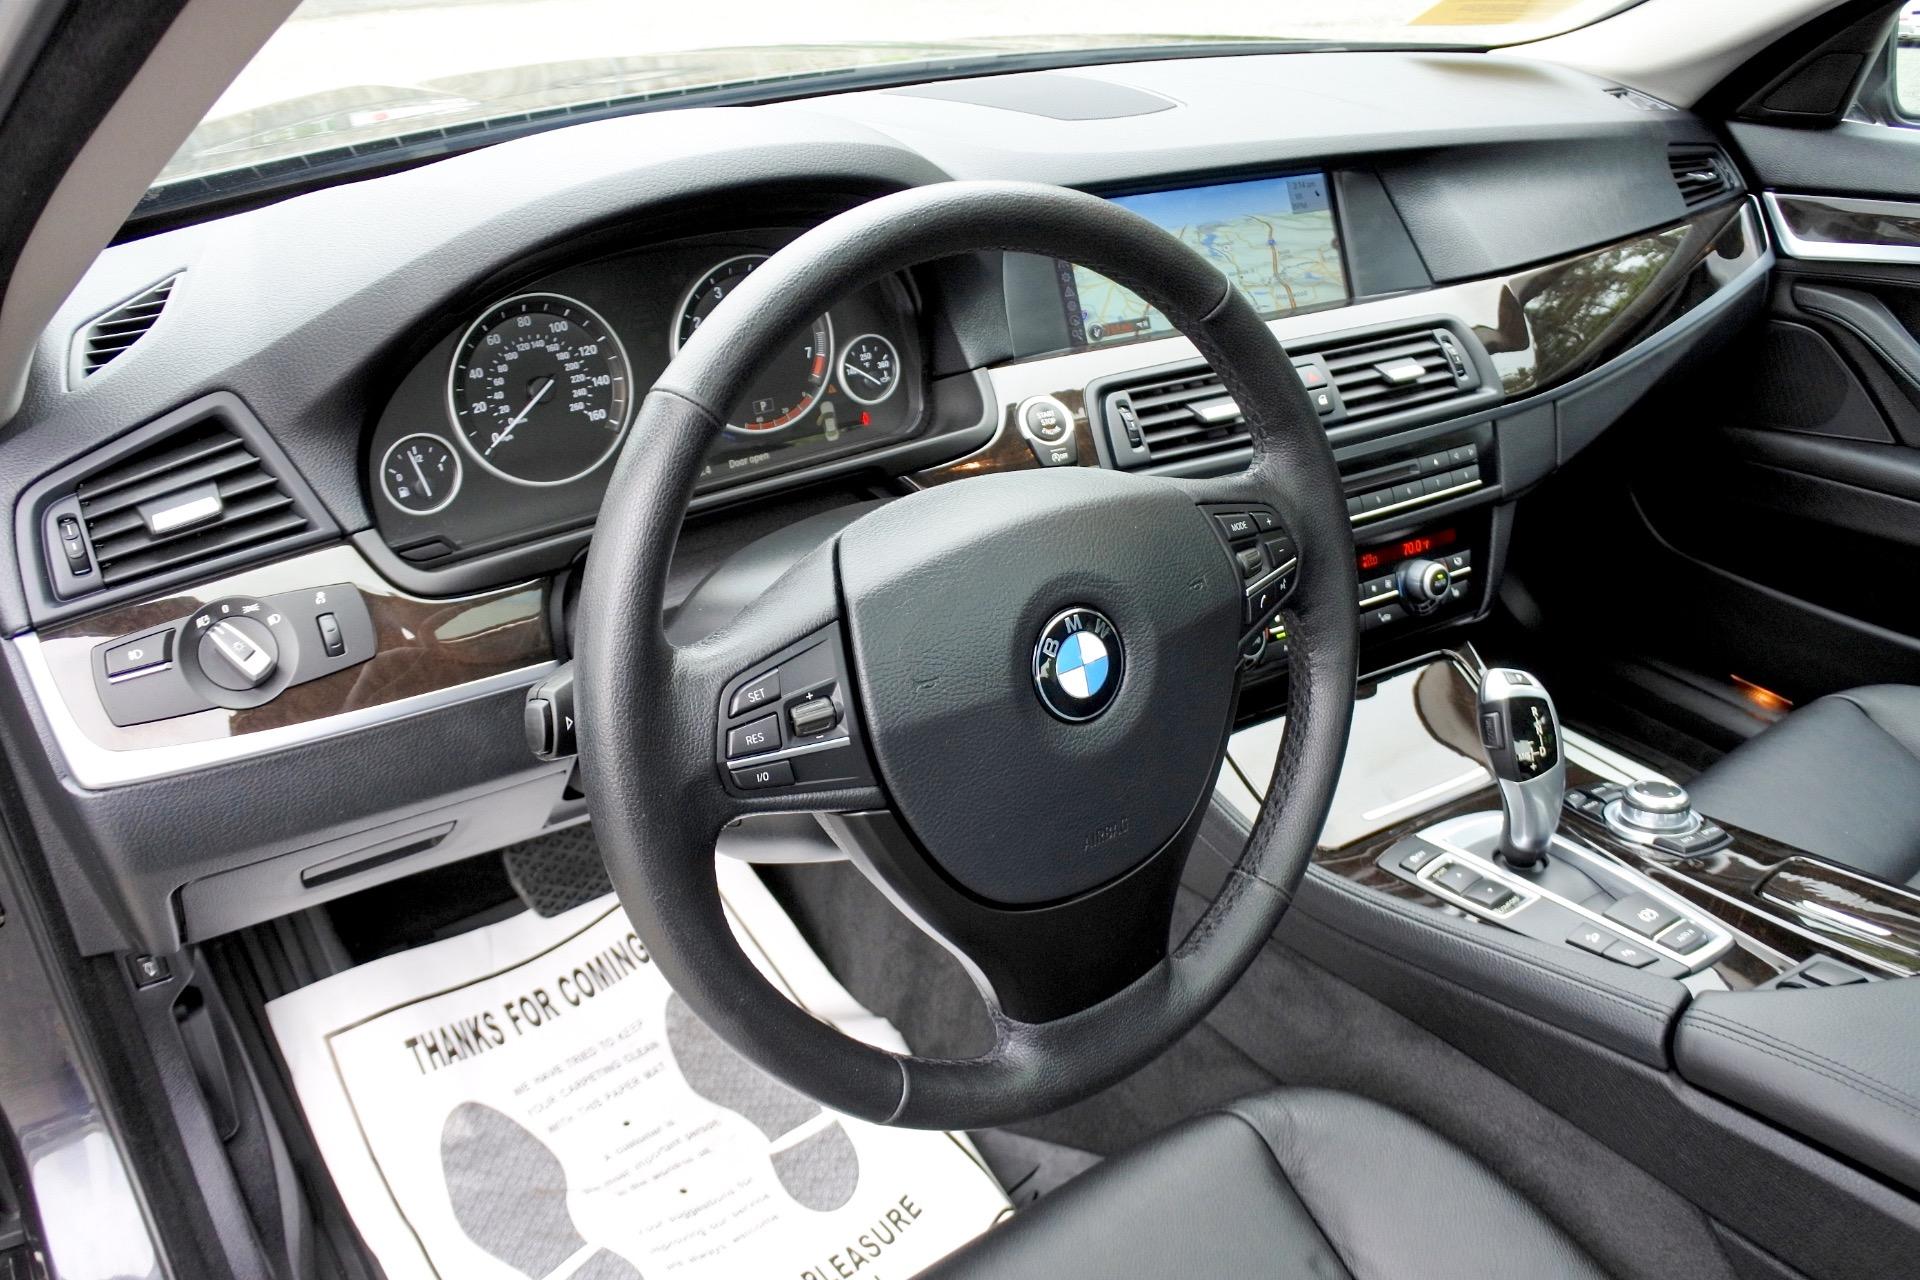 Used 2012 BMW 5 Series 528i xDrive AWD Used 2012 BMW 5 Series 528i xDrive AWD for sale  at Metro West Motorcars LLC in Shrewsbury MA 13